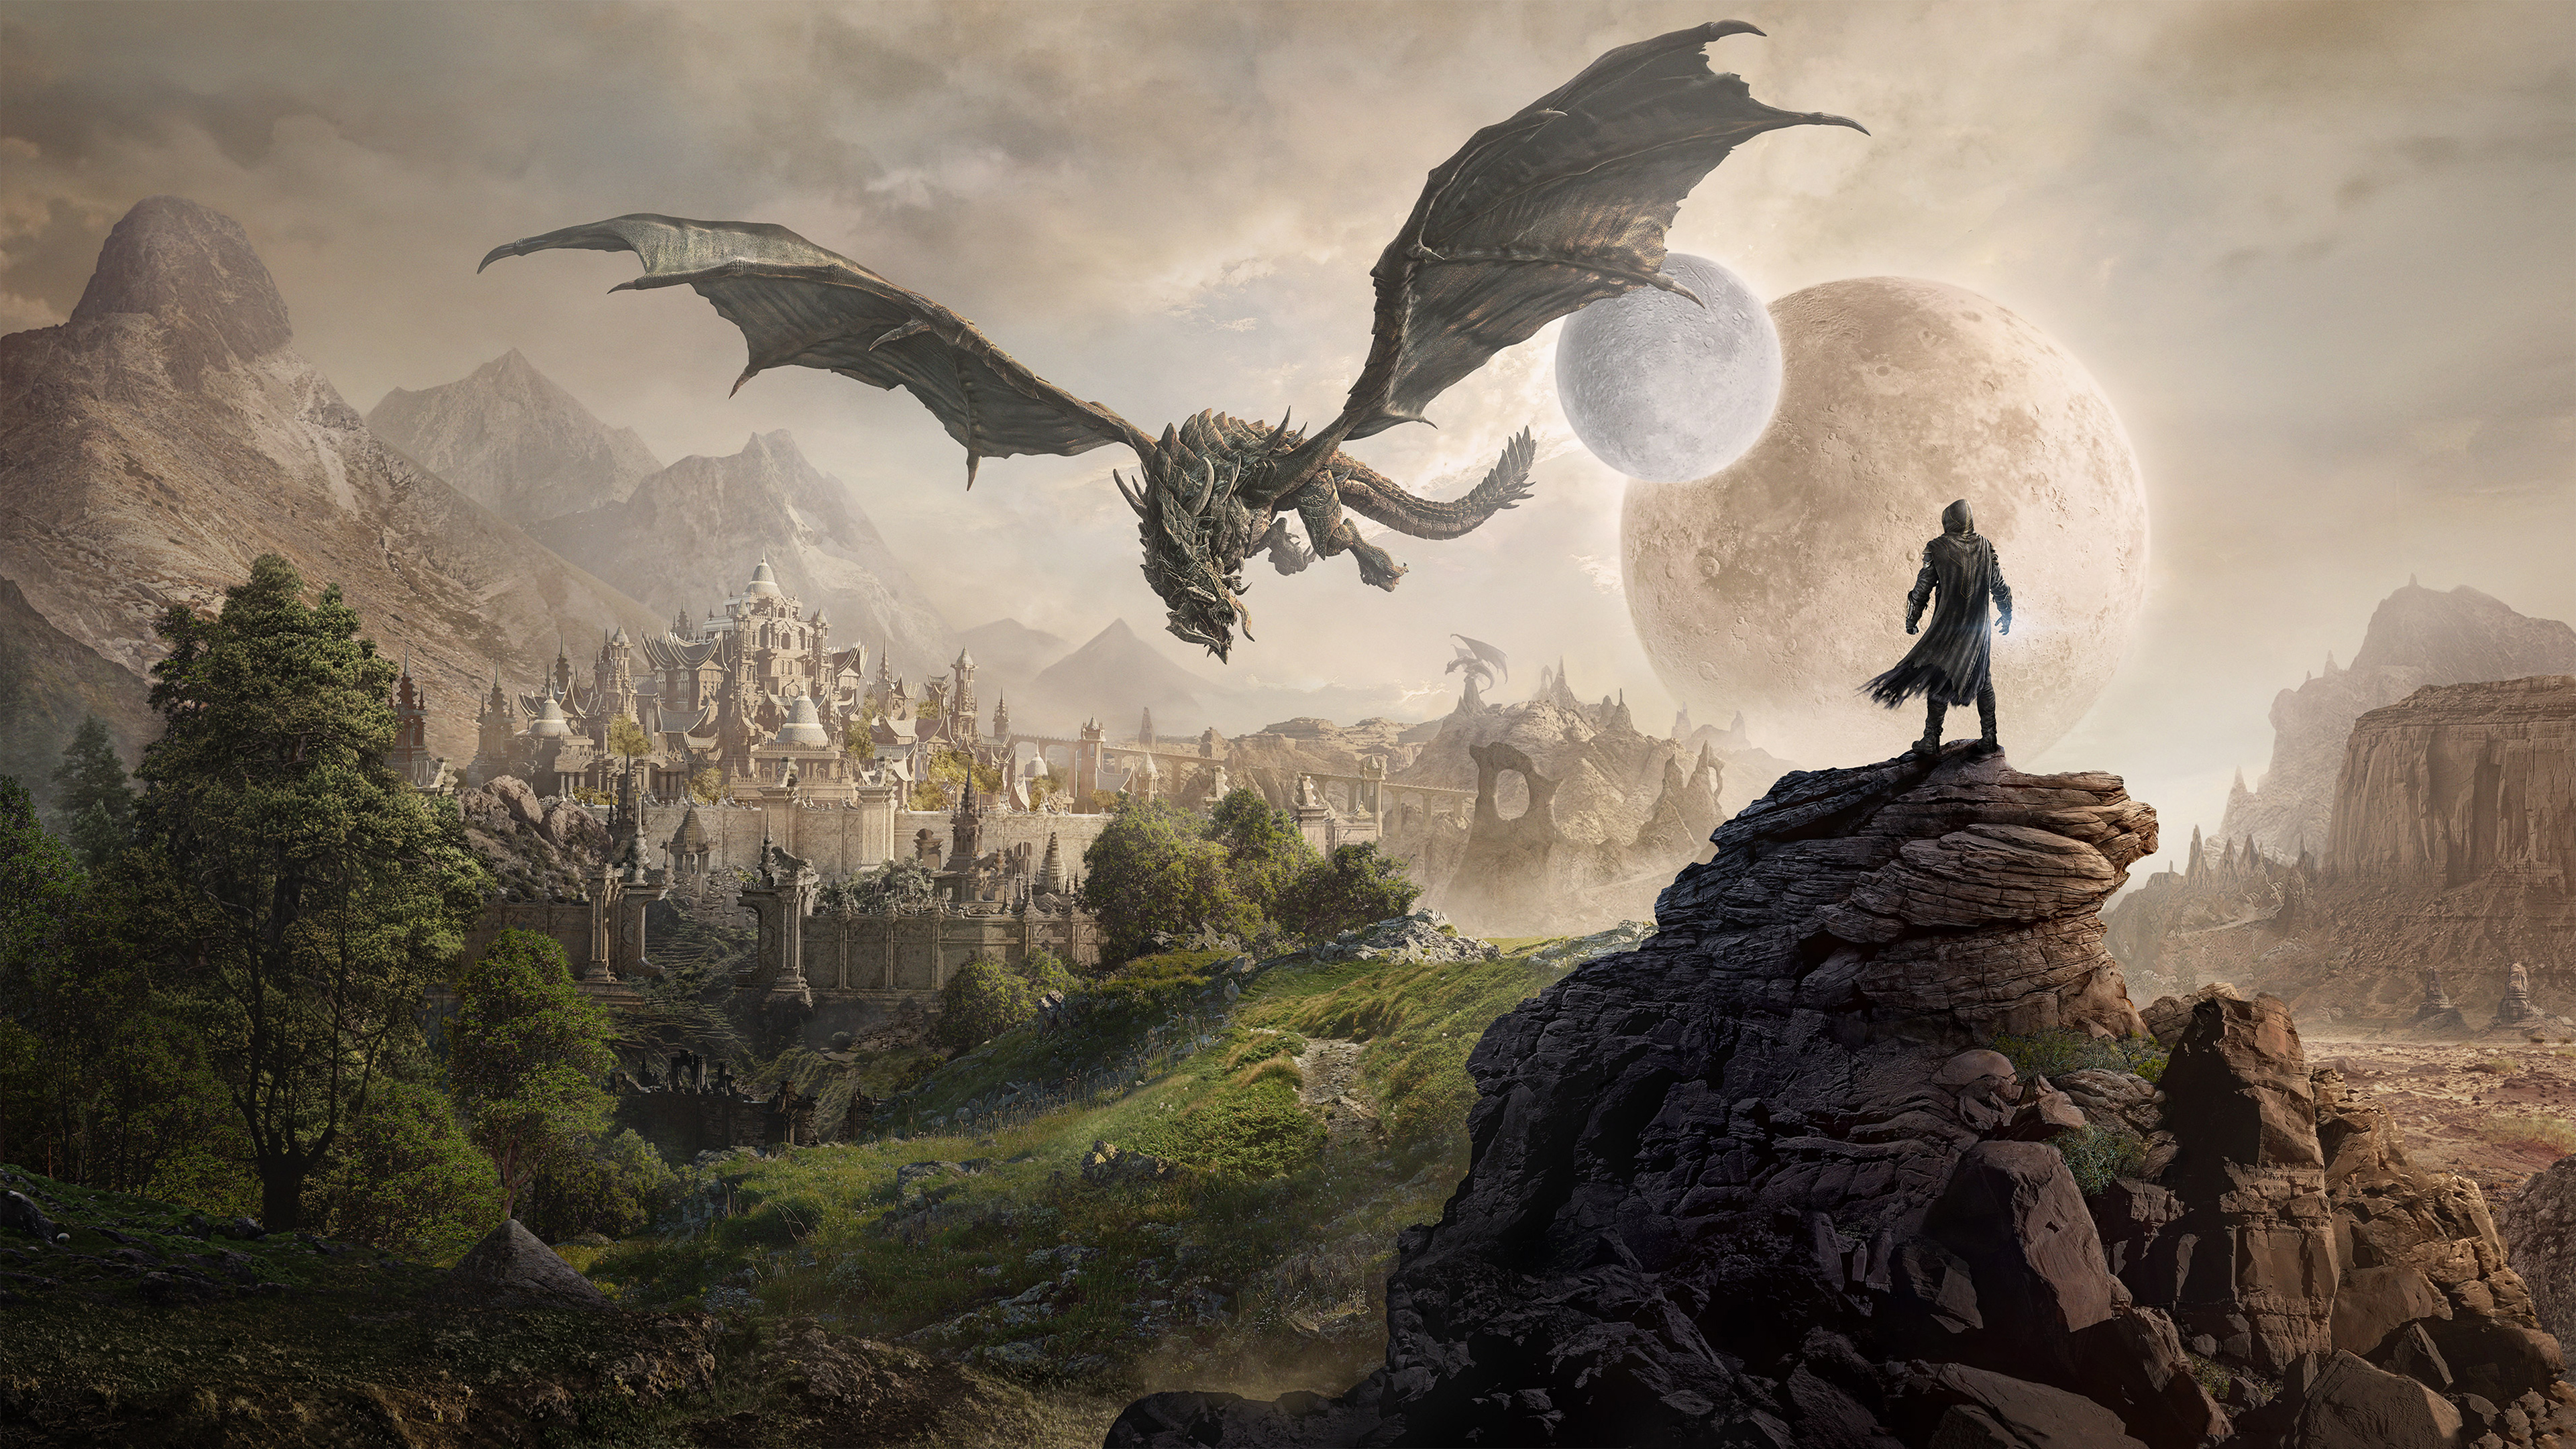 Elsweyr The Elder Scrolls Online 2019 4k Hd Games 4k